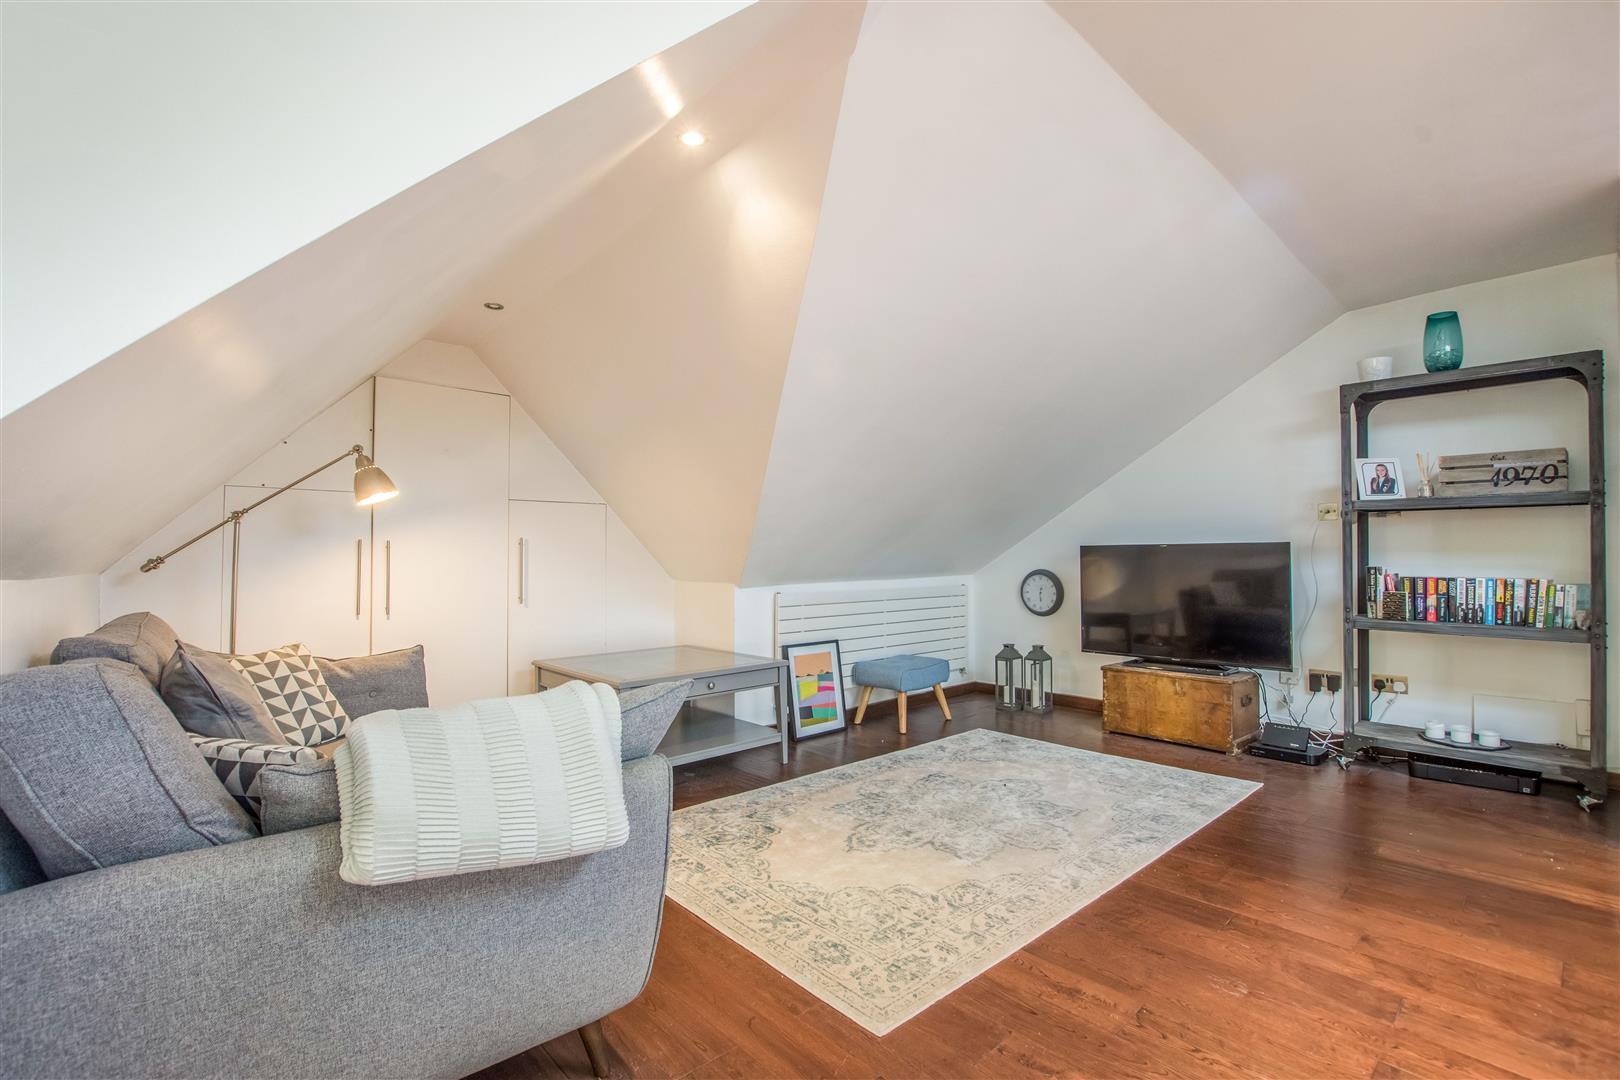 2 Bedroom Flat For Sale In Woolstone Road Se23 London